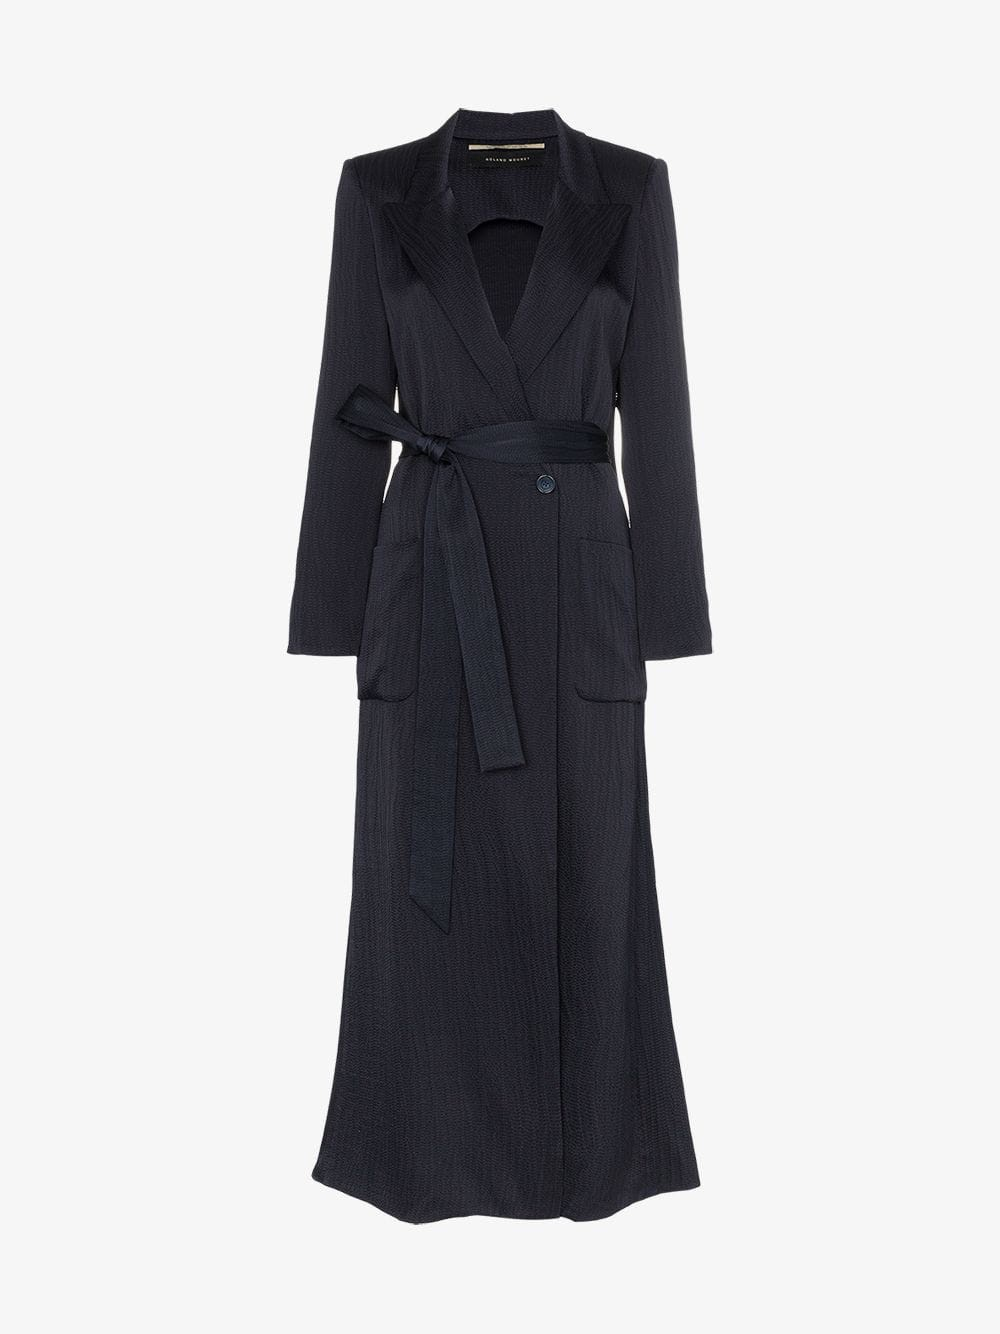 Roland Mouret Heathcoat hammered silk coat in blue